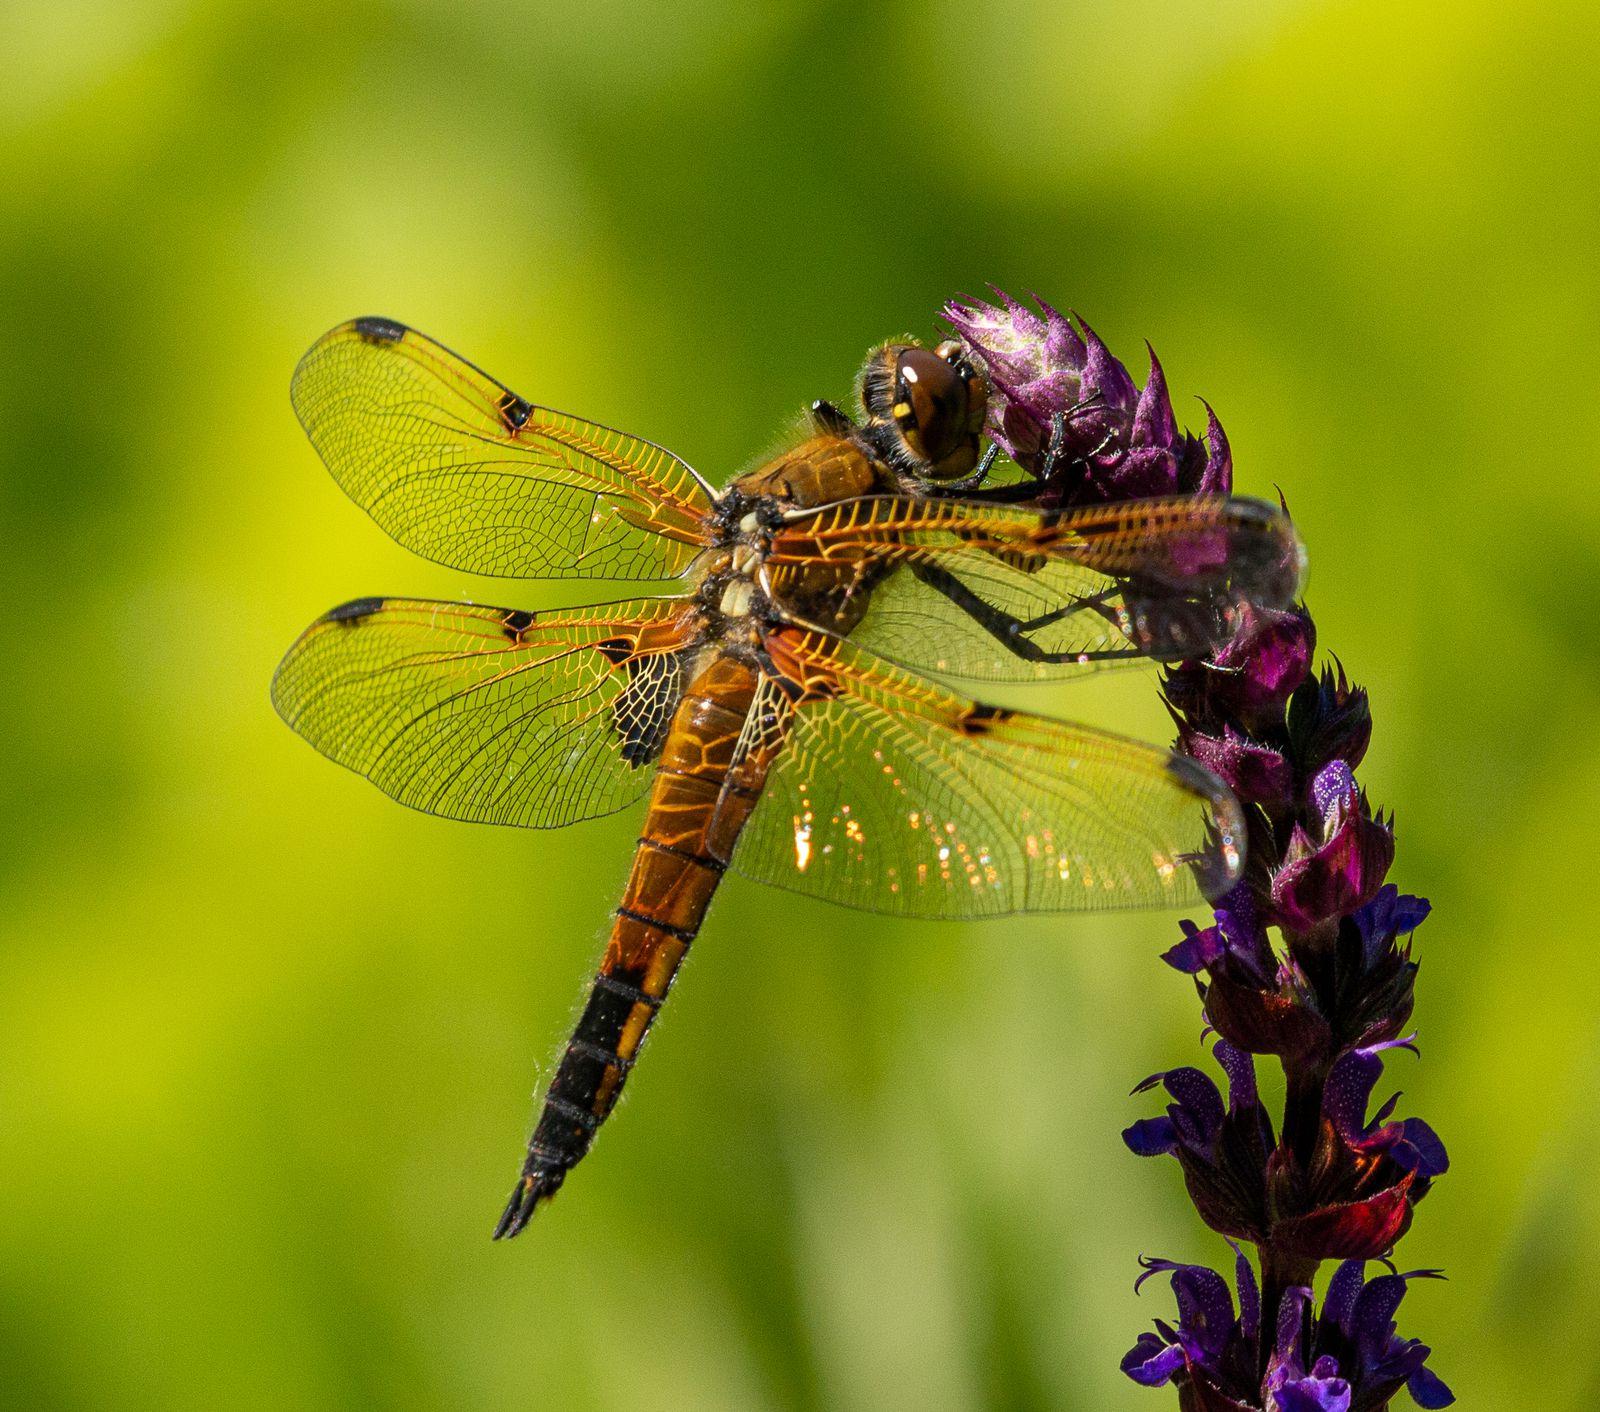 Libellule à quatre taches - Four-spotted Chaser - [Libellula quadrimaculata)]